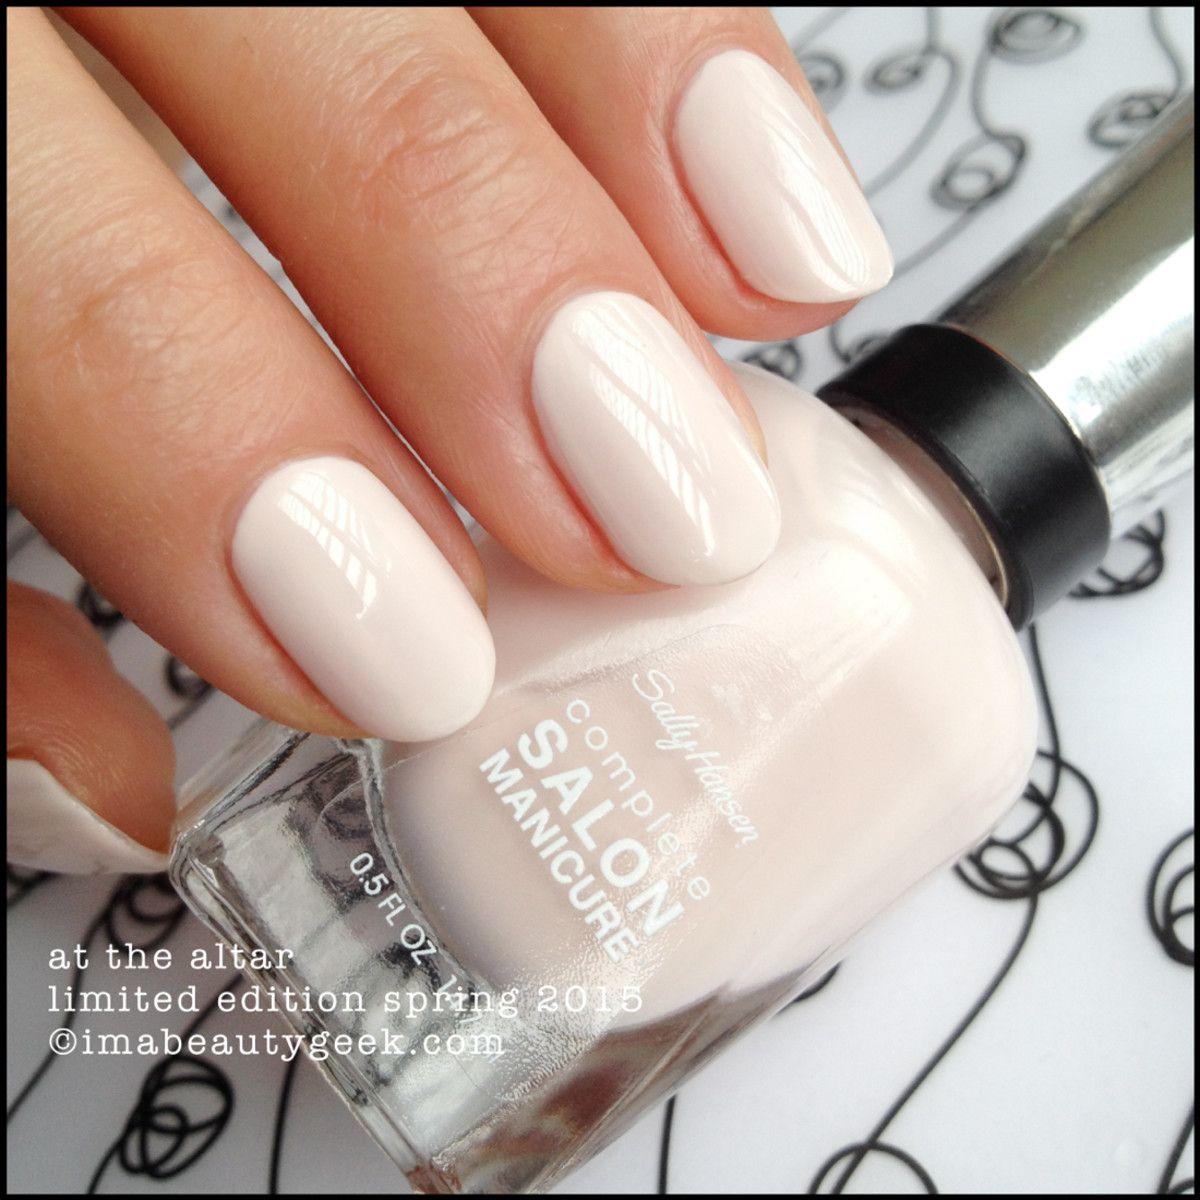 Sally Hansen Limited Edition Bridal Shades 2015 Paznokcie Lakier